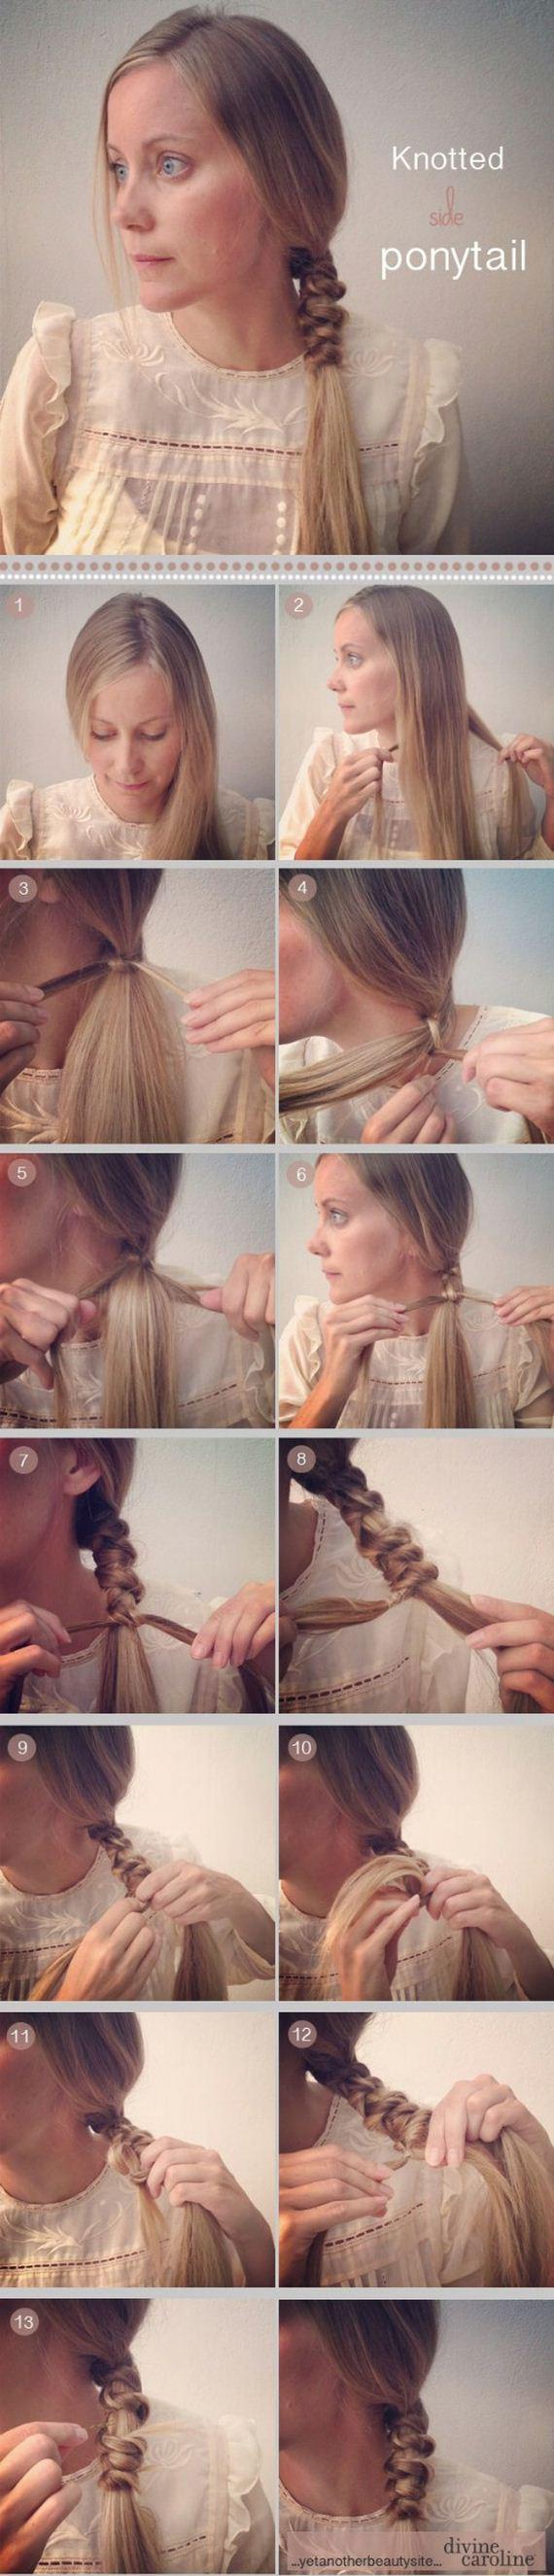 04-double-ponytail